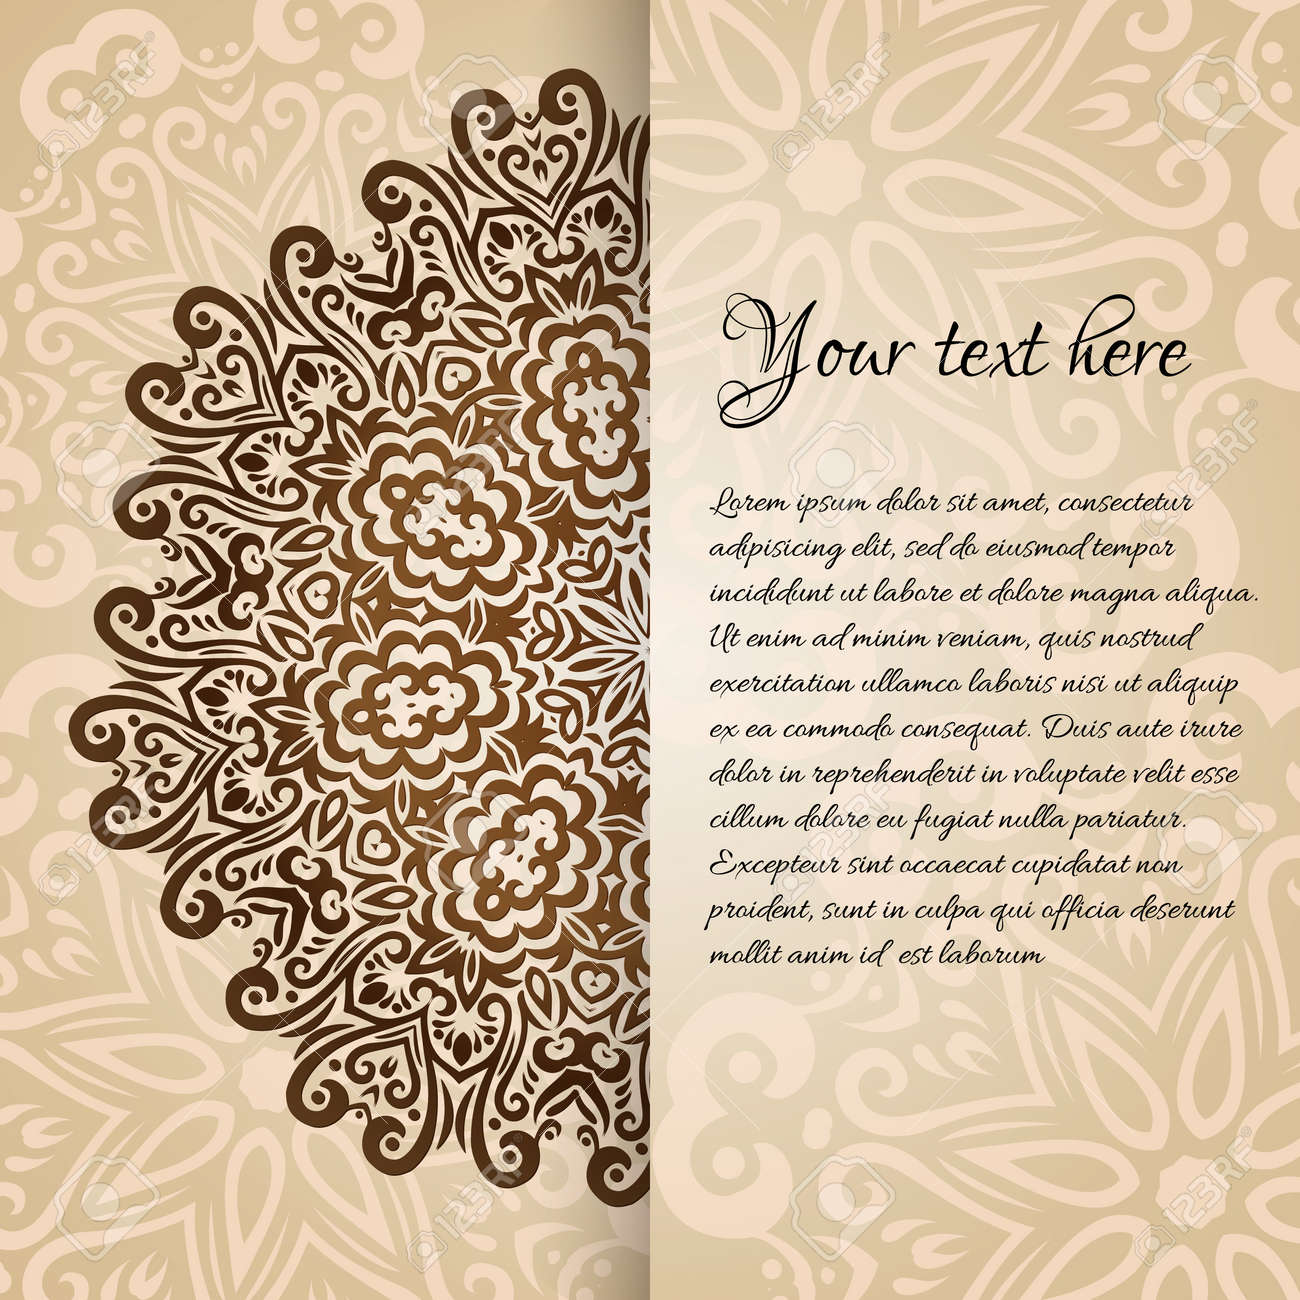 Lacy Vector Wedding Card Template Romantic Vintage Wedding Invitation